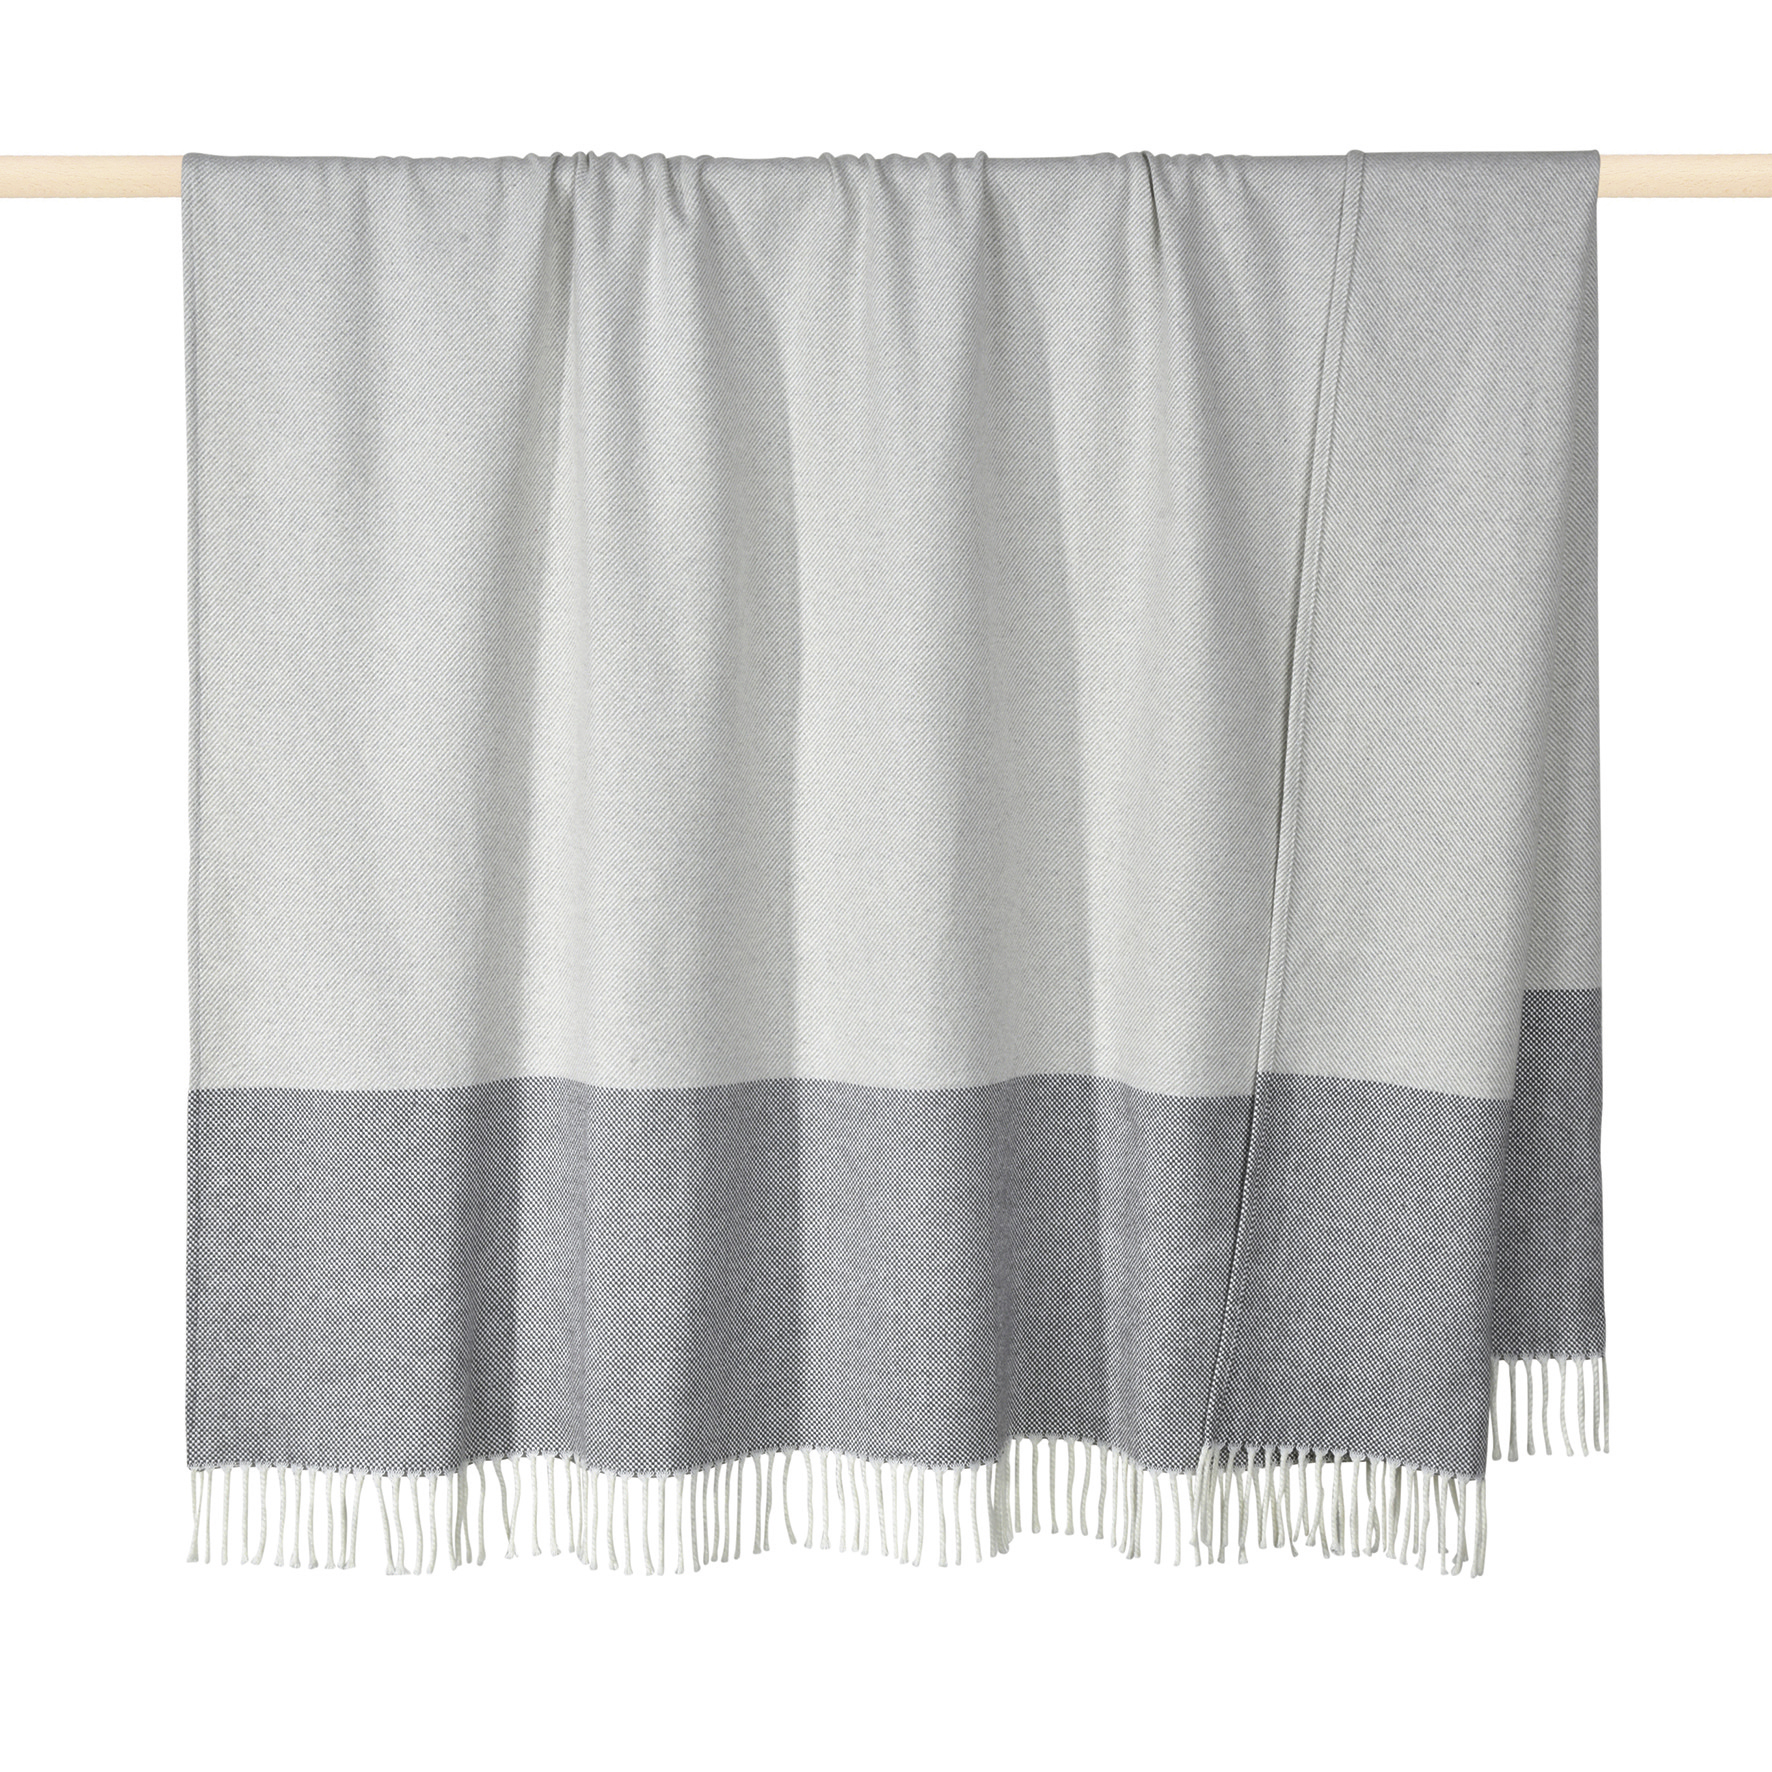 Decke - Stripes Grey 150x200 - PAD home design